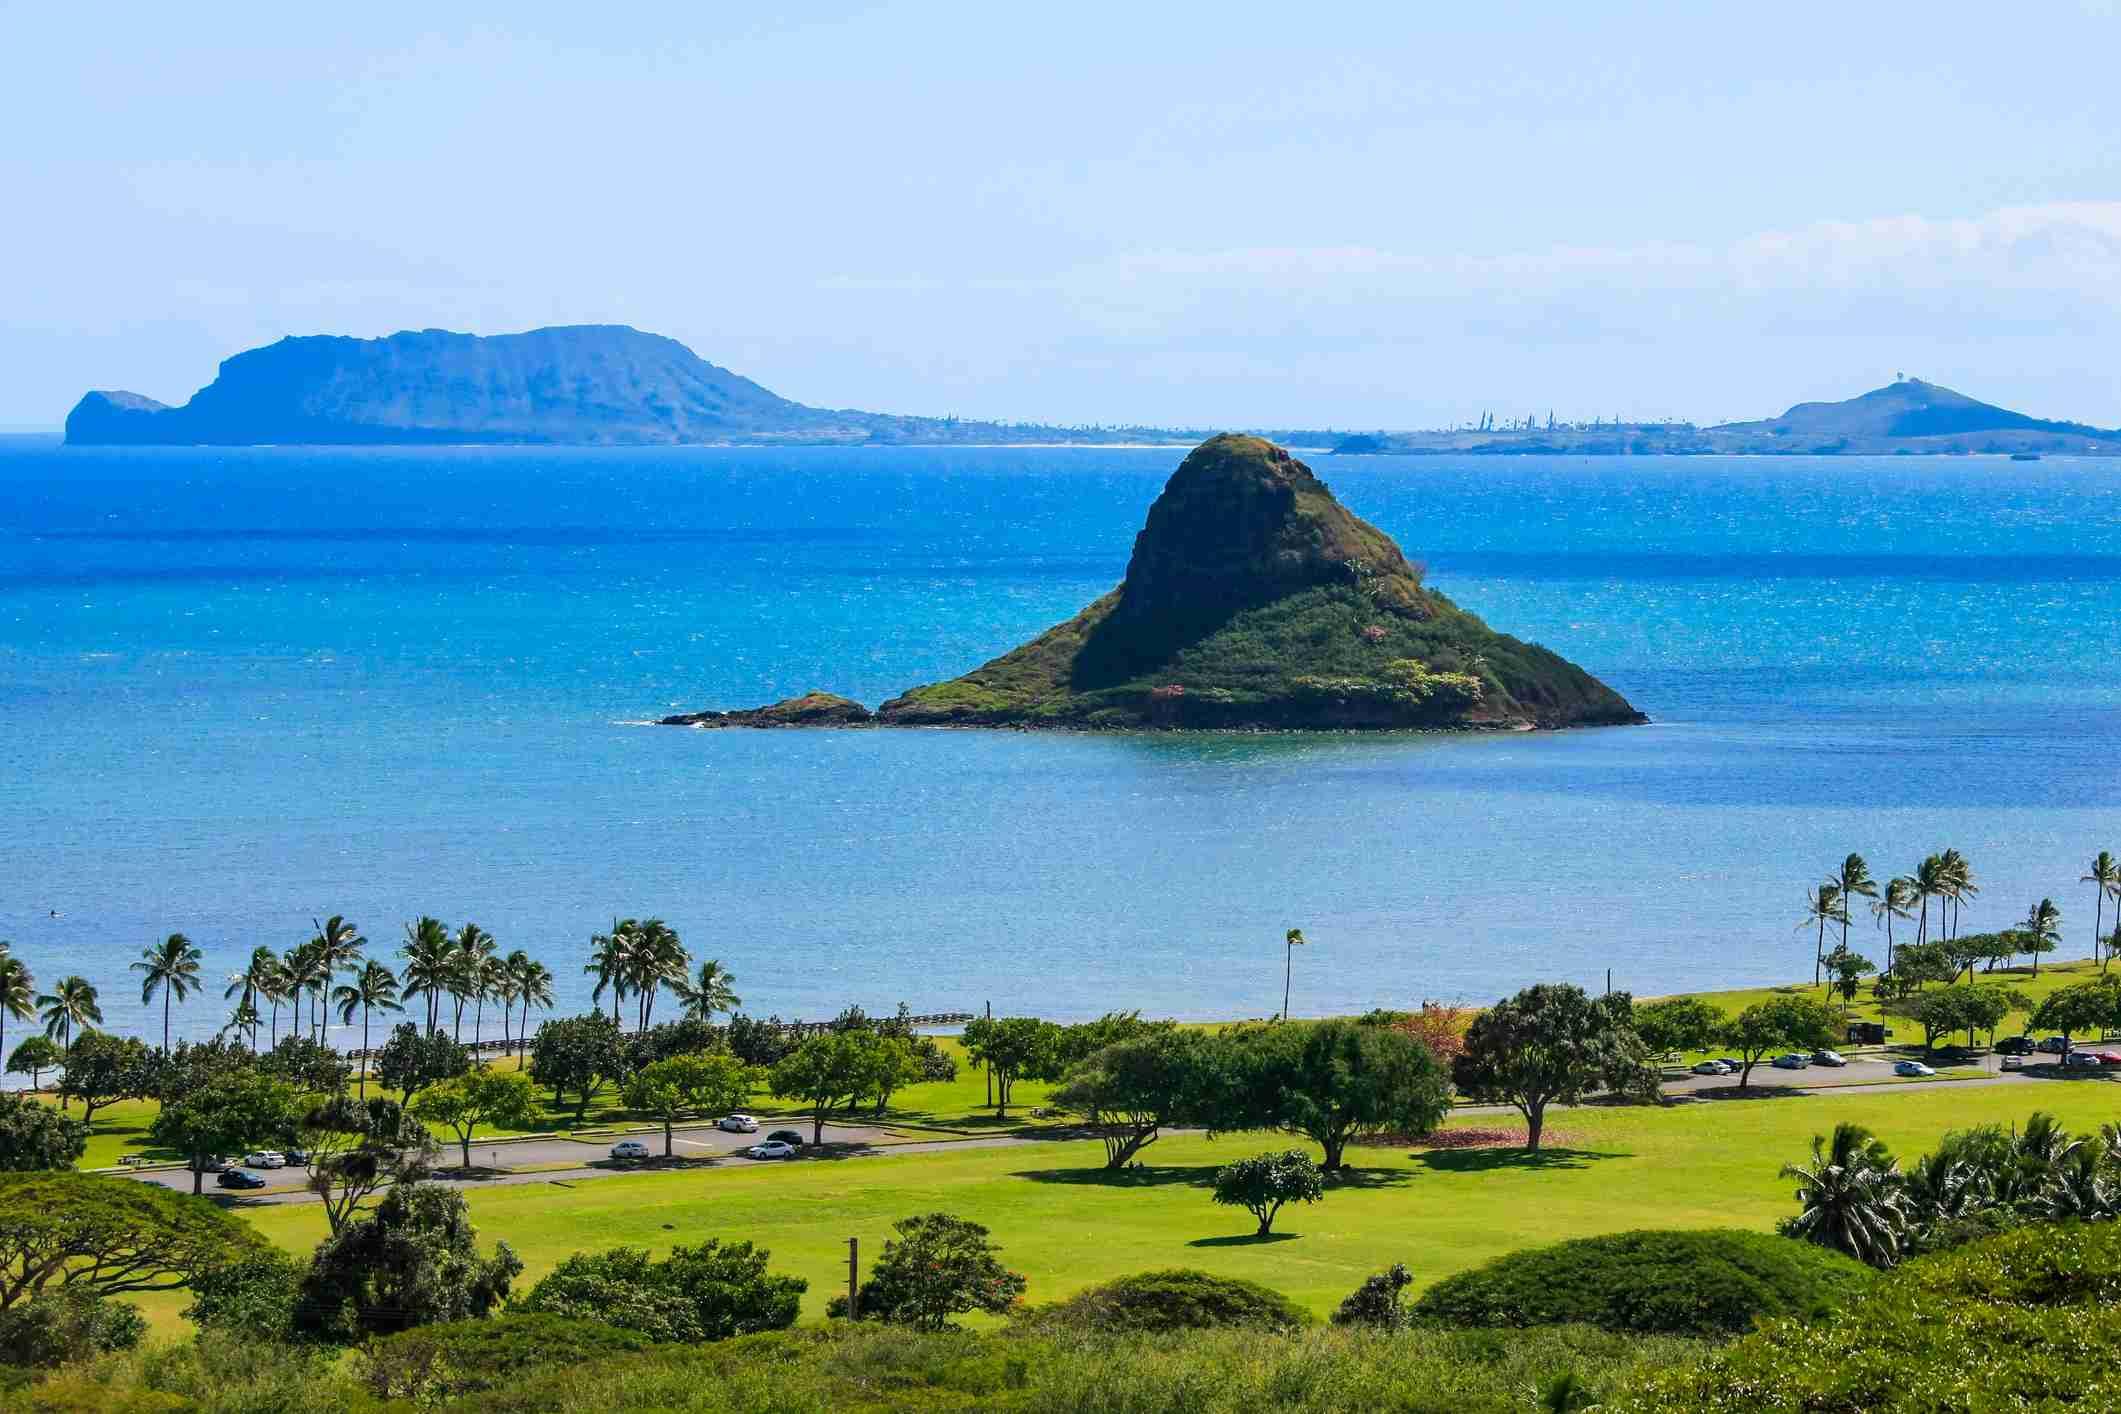 Mokoli'i, also known as Chinaman's Hat Island, in Kaneohe Bay, Oahu.